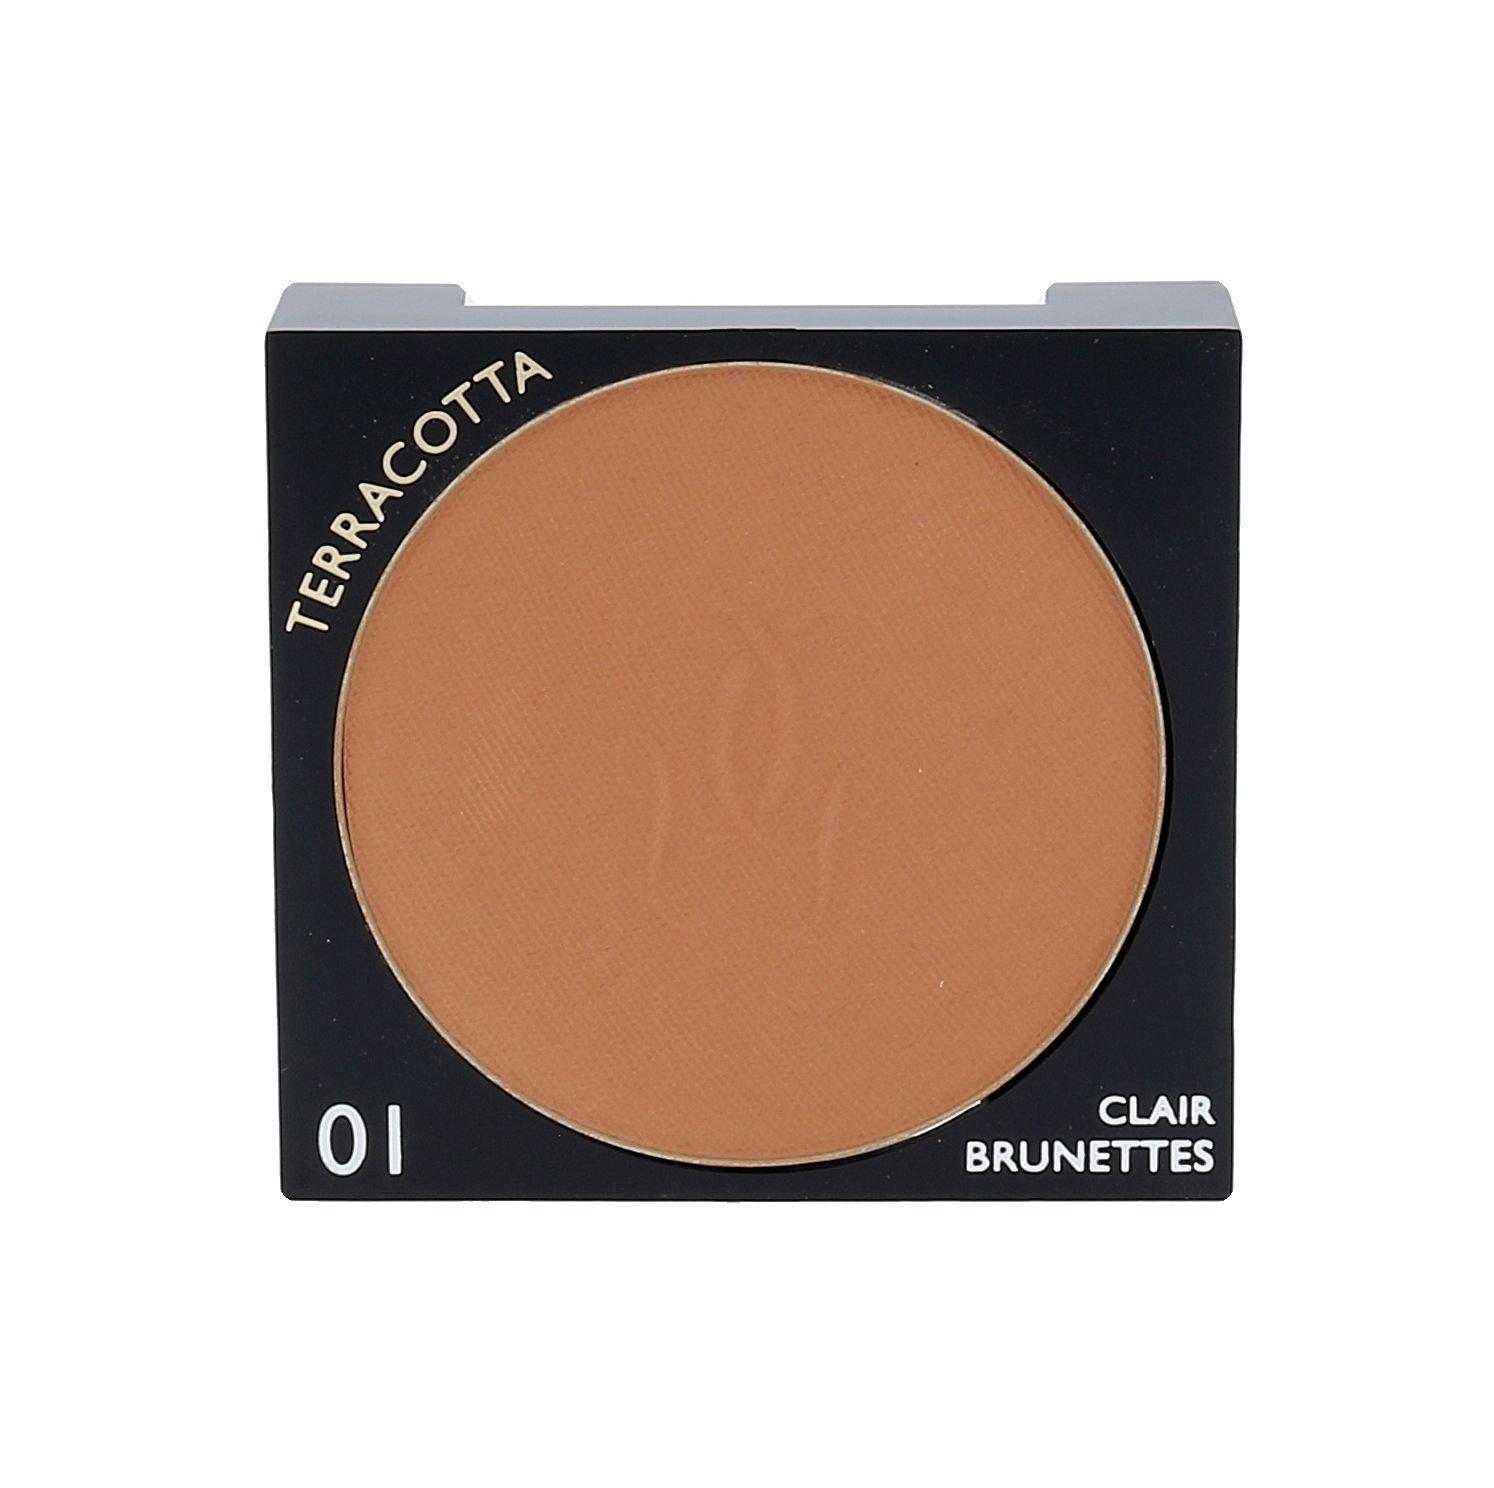 Guerlain Terracotta Cosmetic 6ml 01 Clair-Brunettes